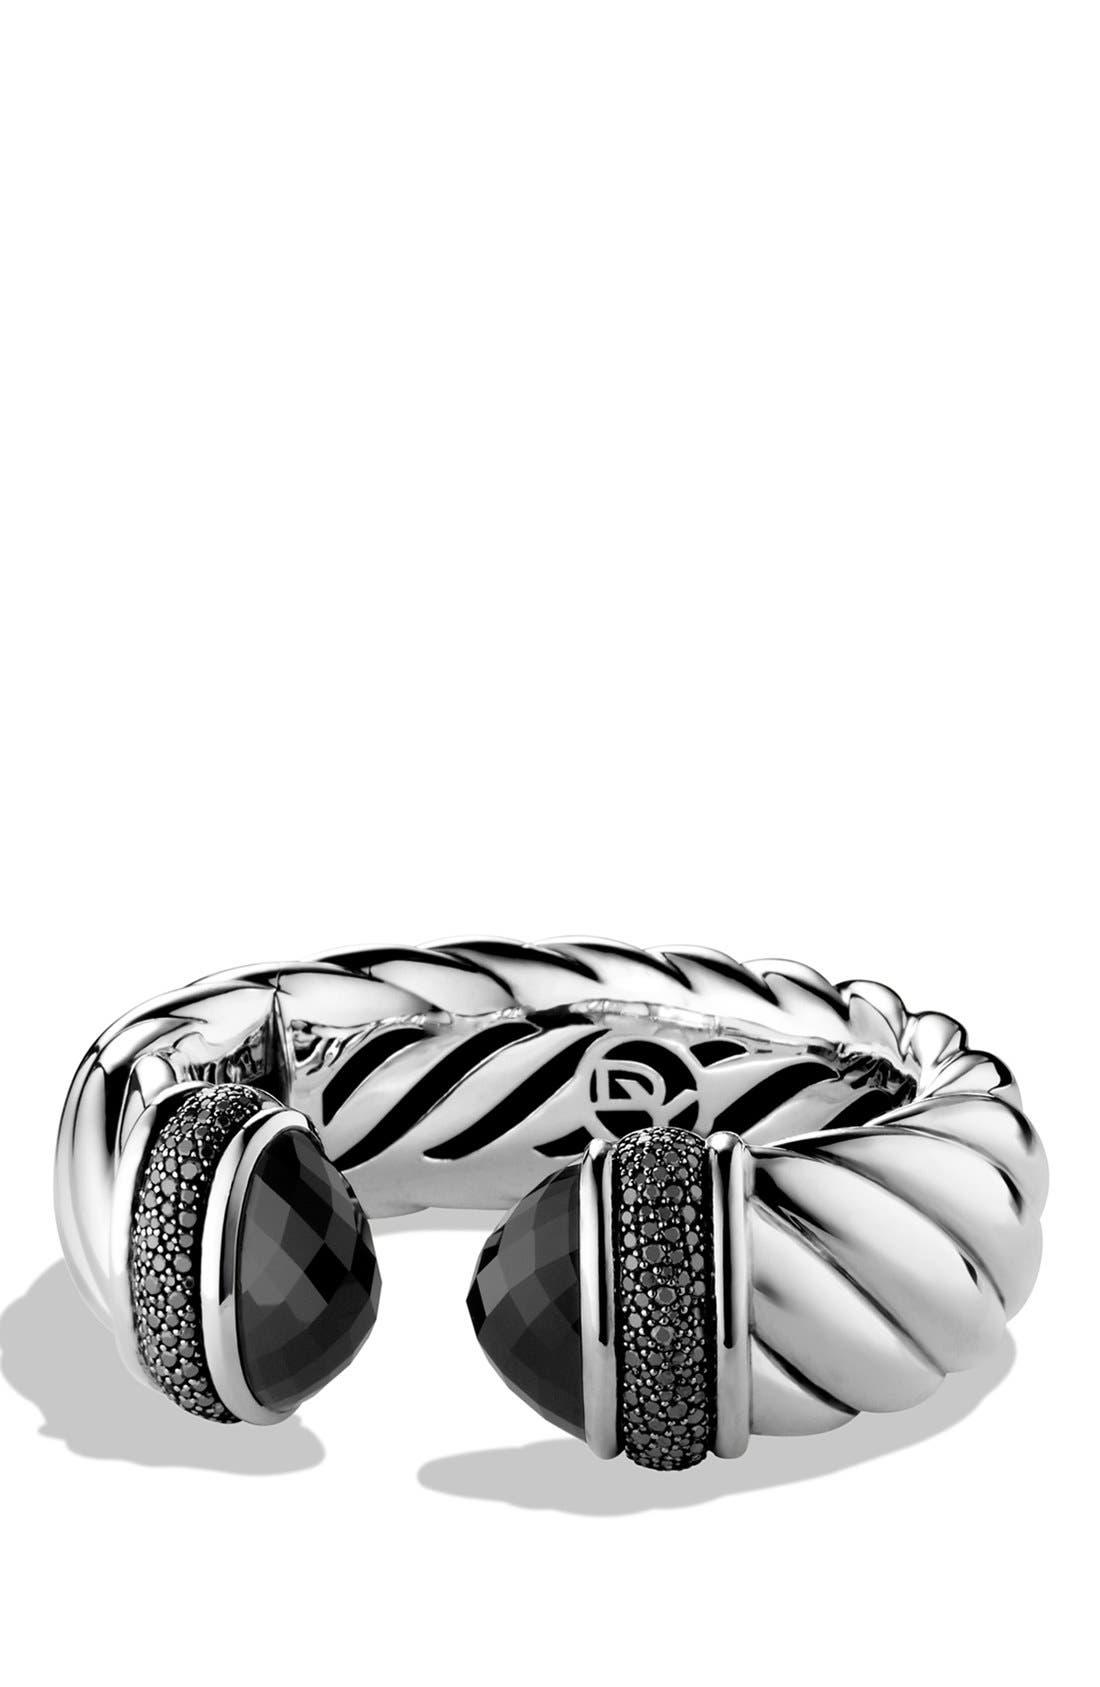 Main Image - David Yurman 'Waverly' Bracelet